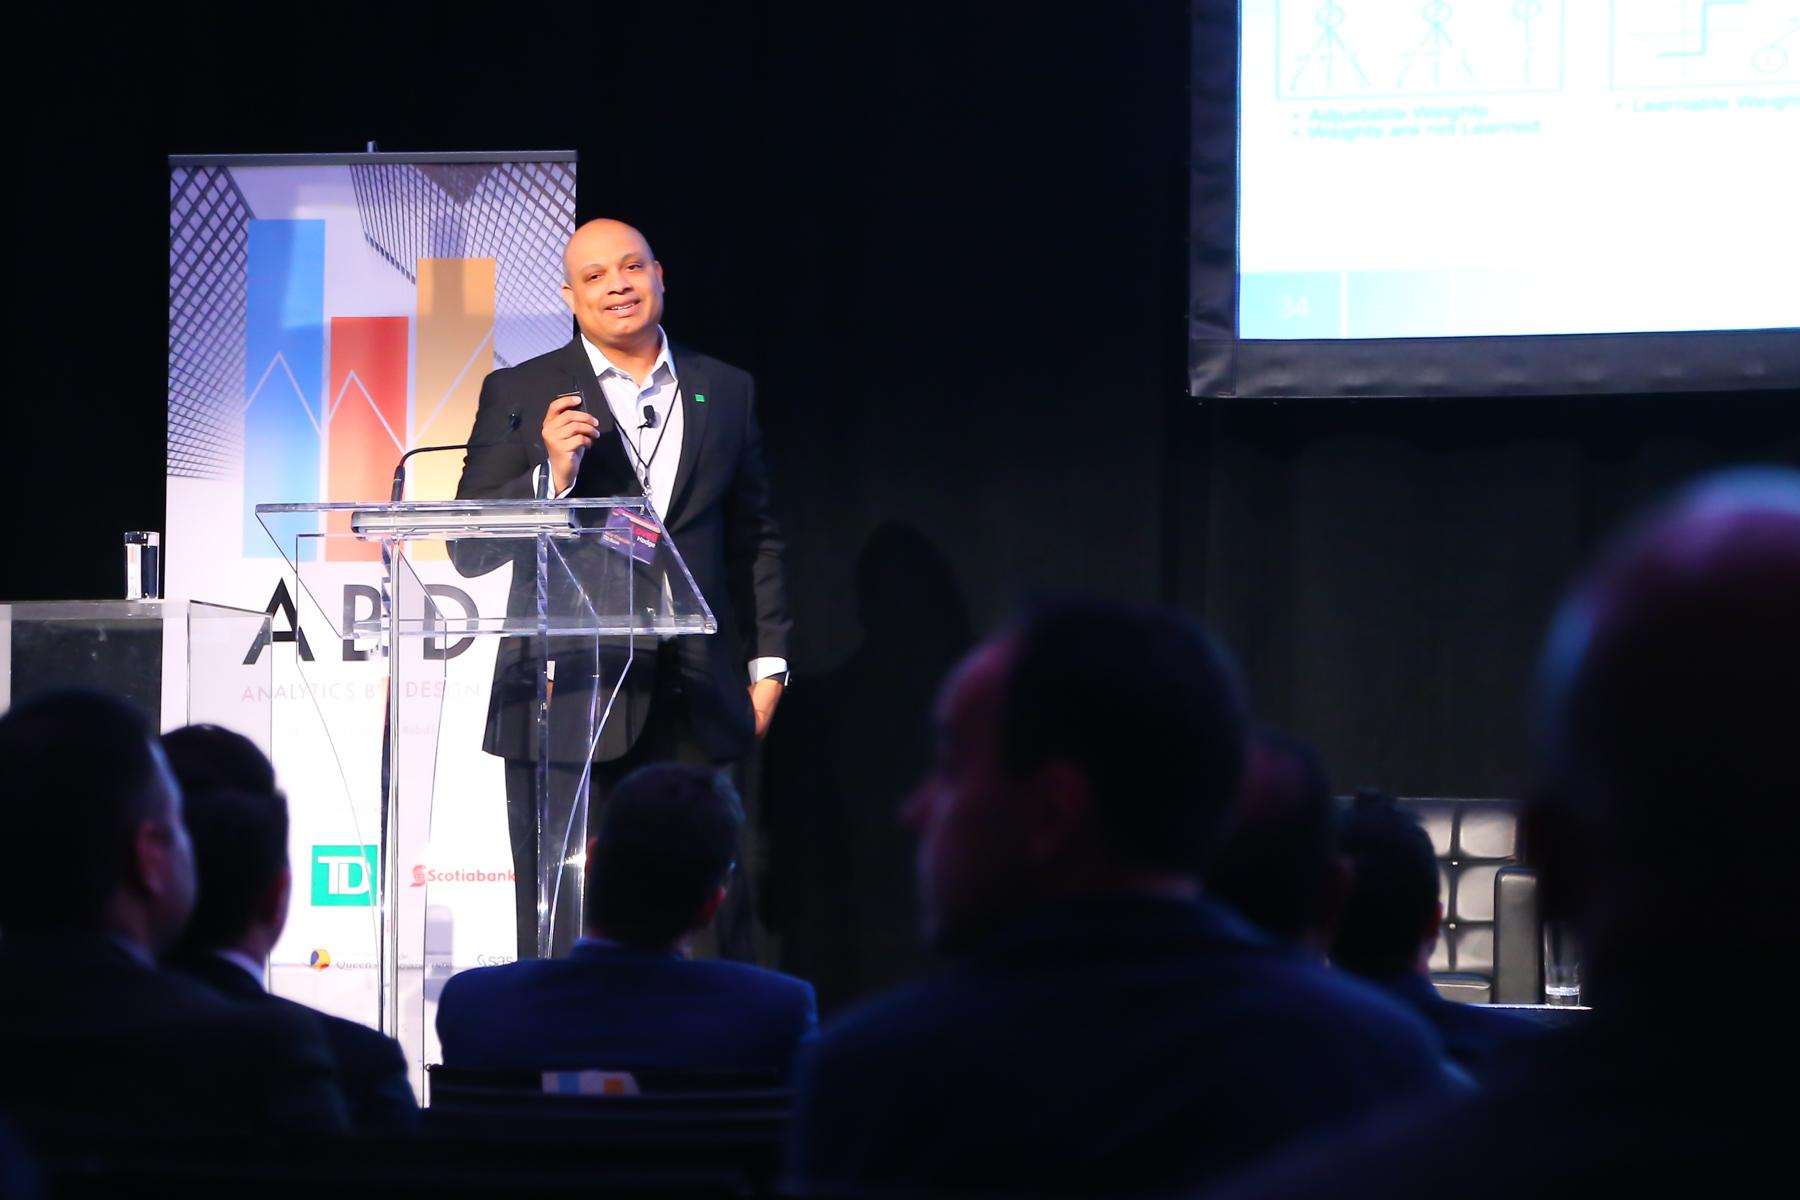 ABD_Conference_2018-020.jpg